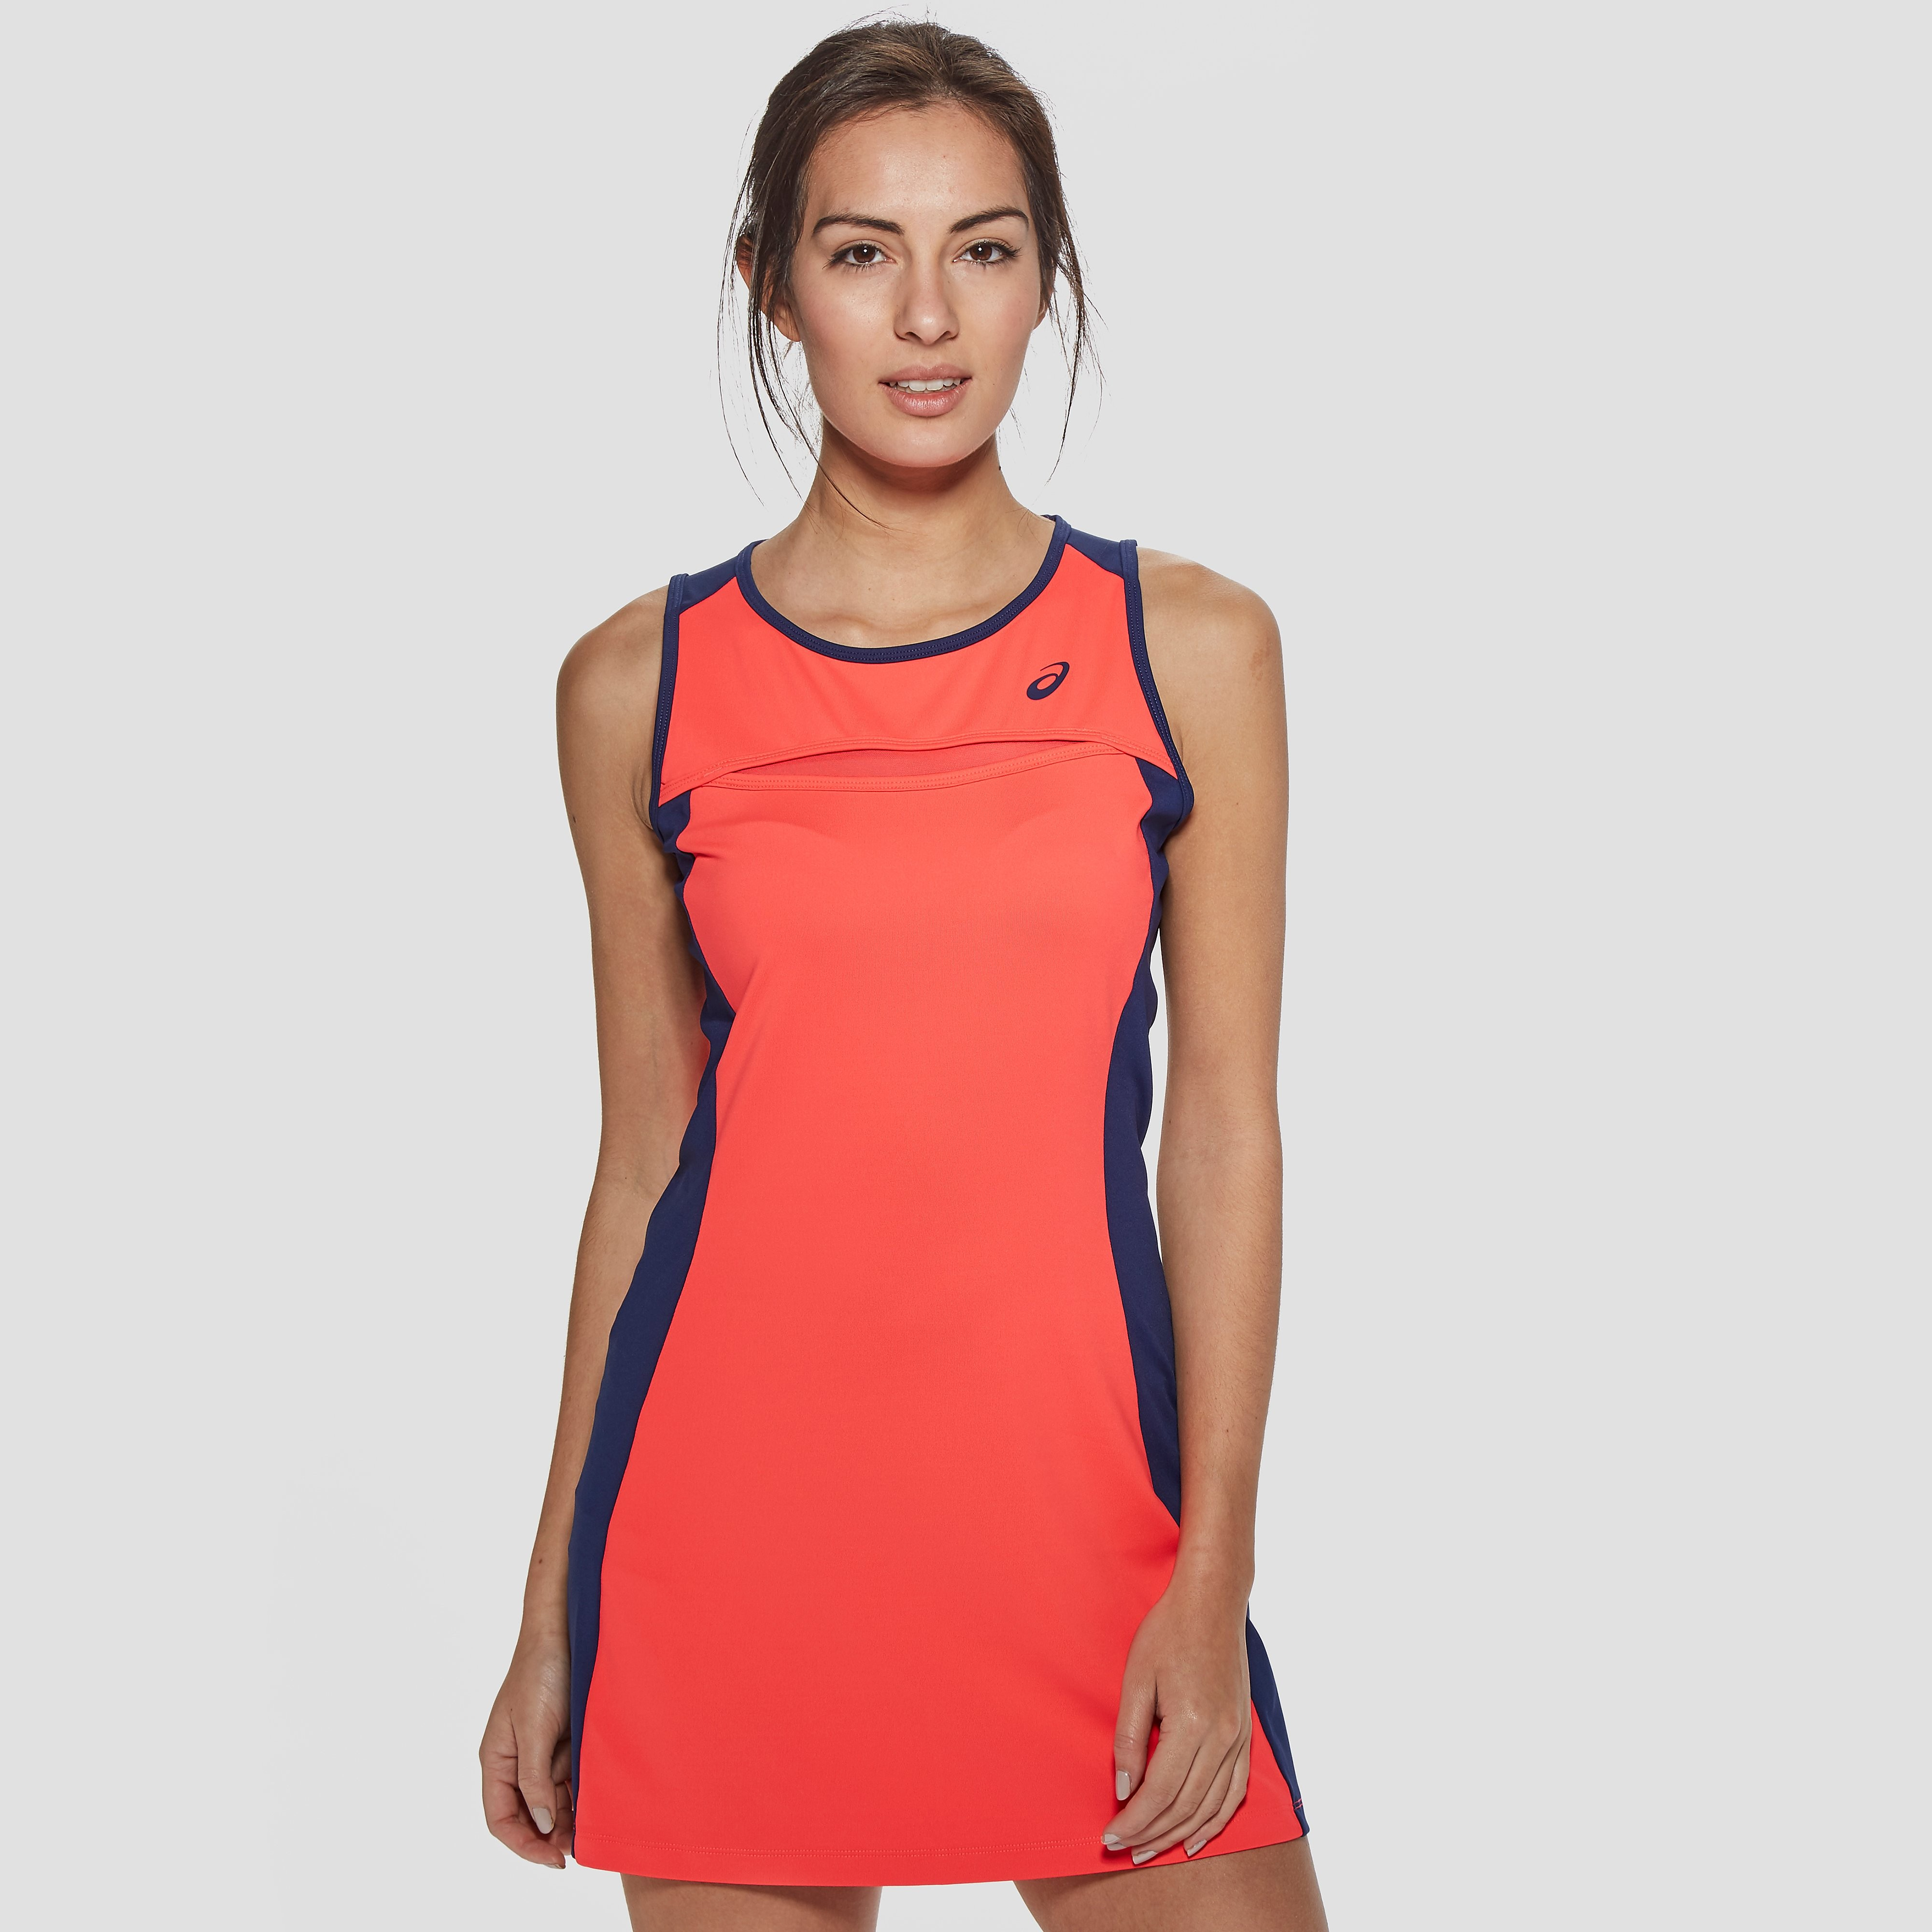 Asics Club Women's Tennis Dress